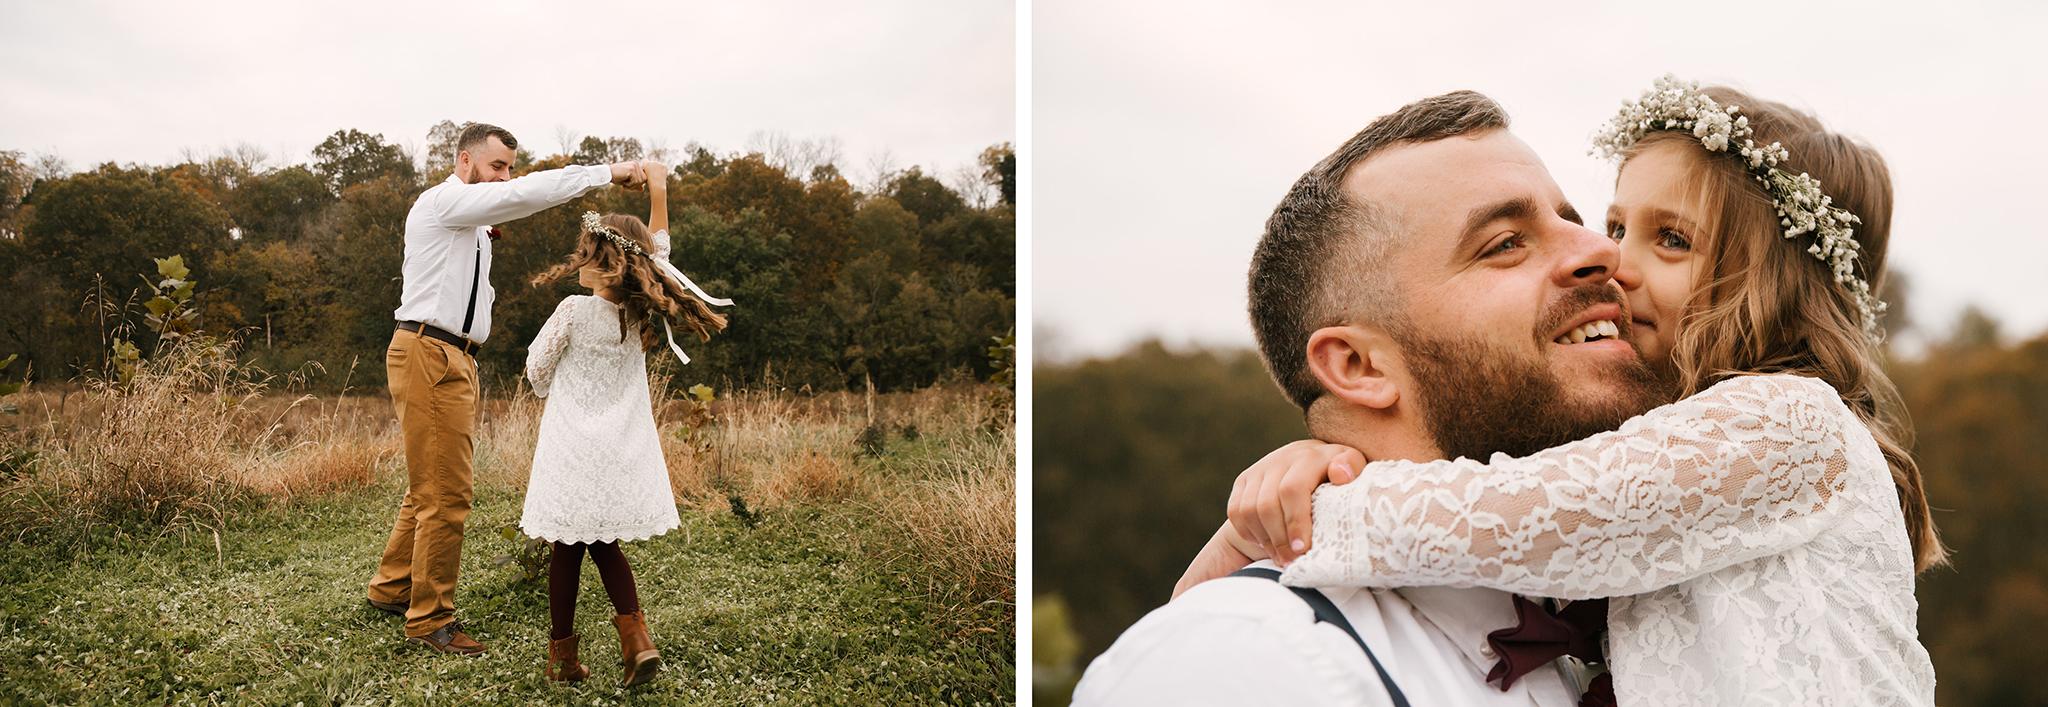 Red-Photographic-Wedding-Kentucky-Cisar-34.JPG